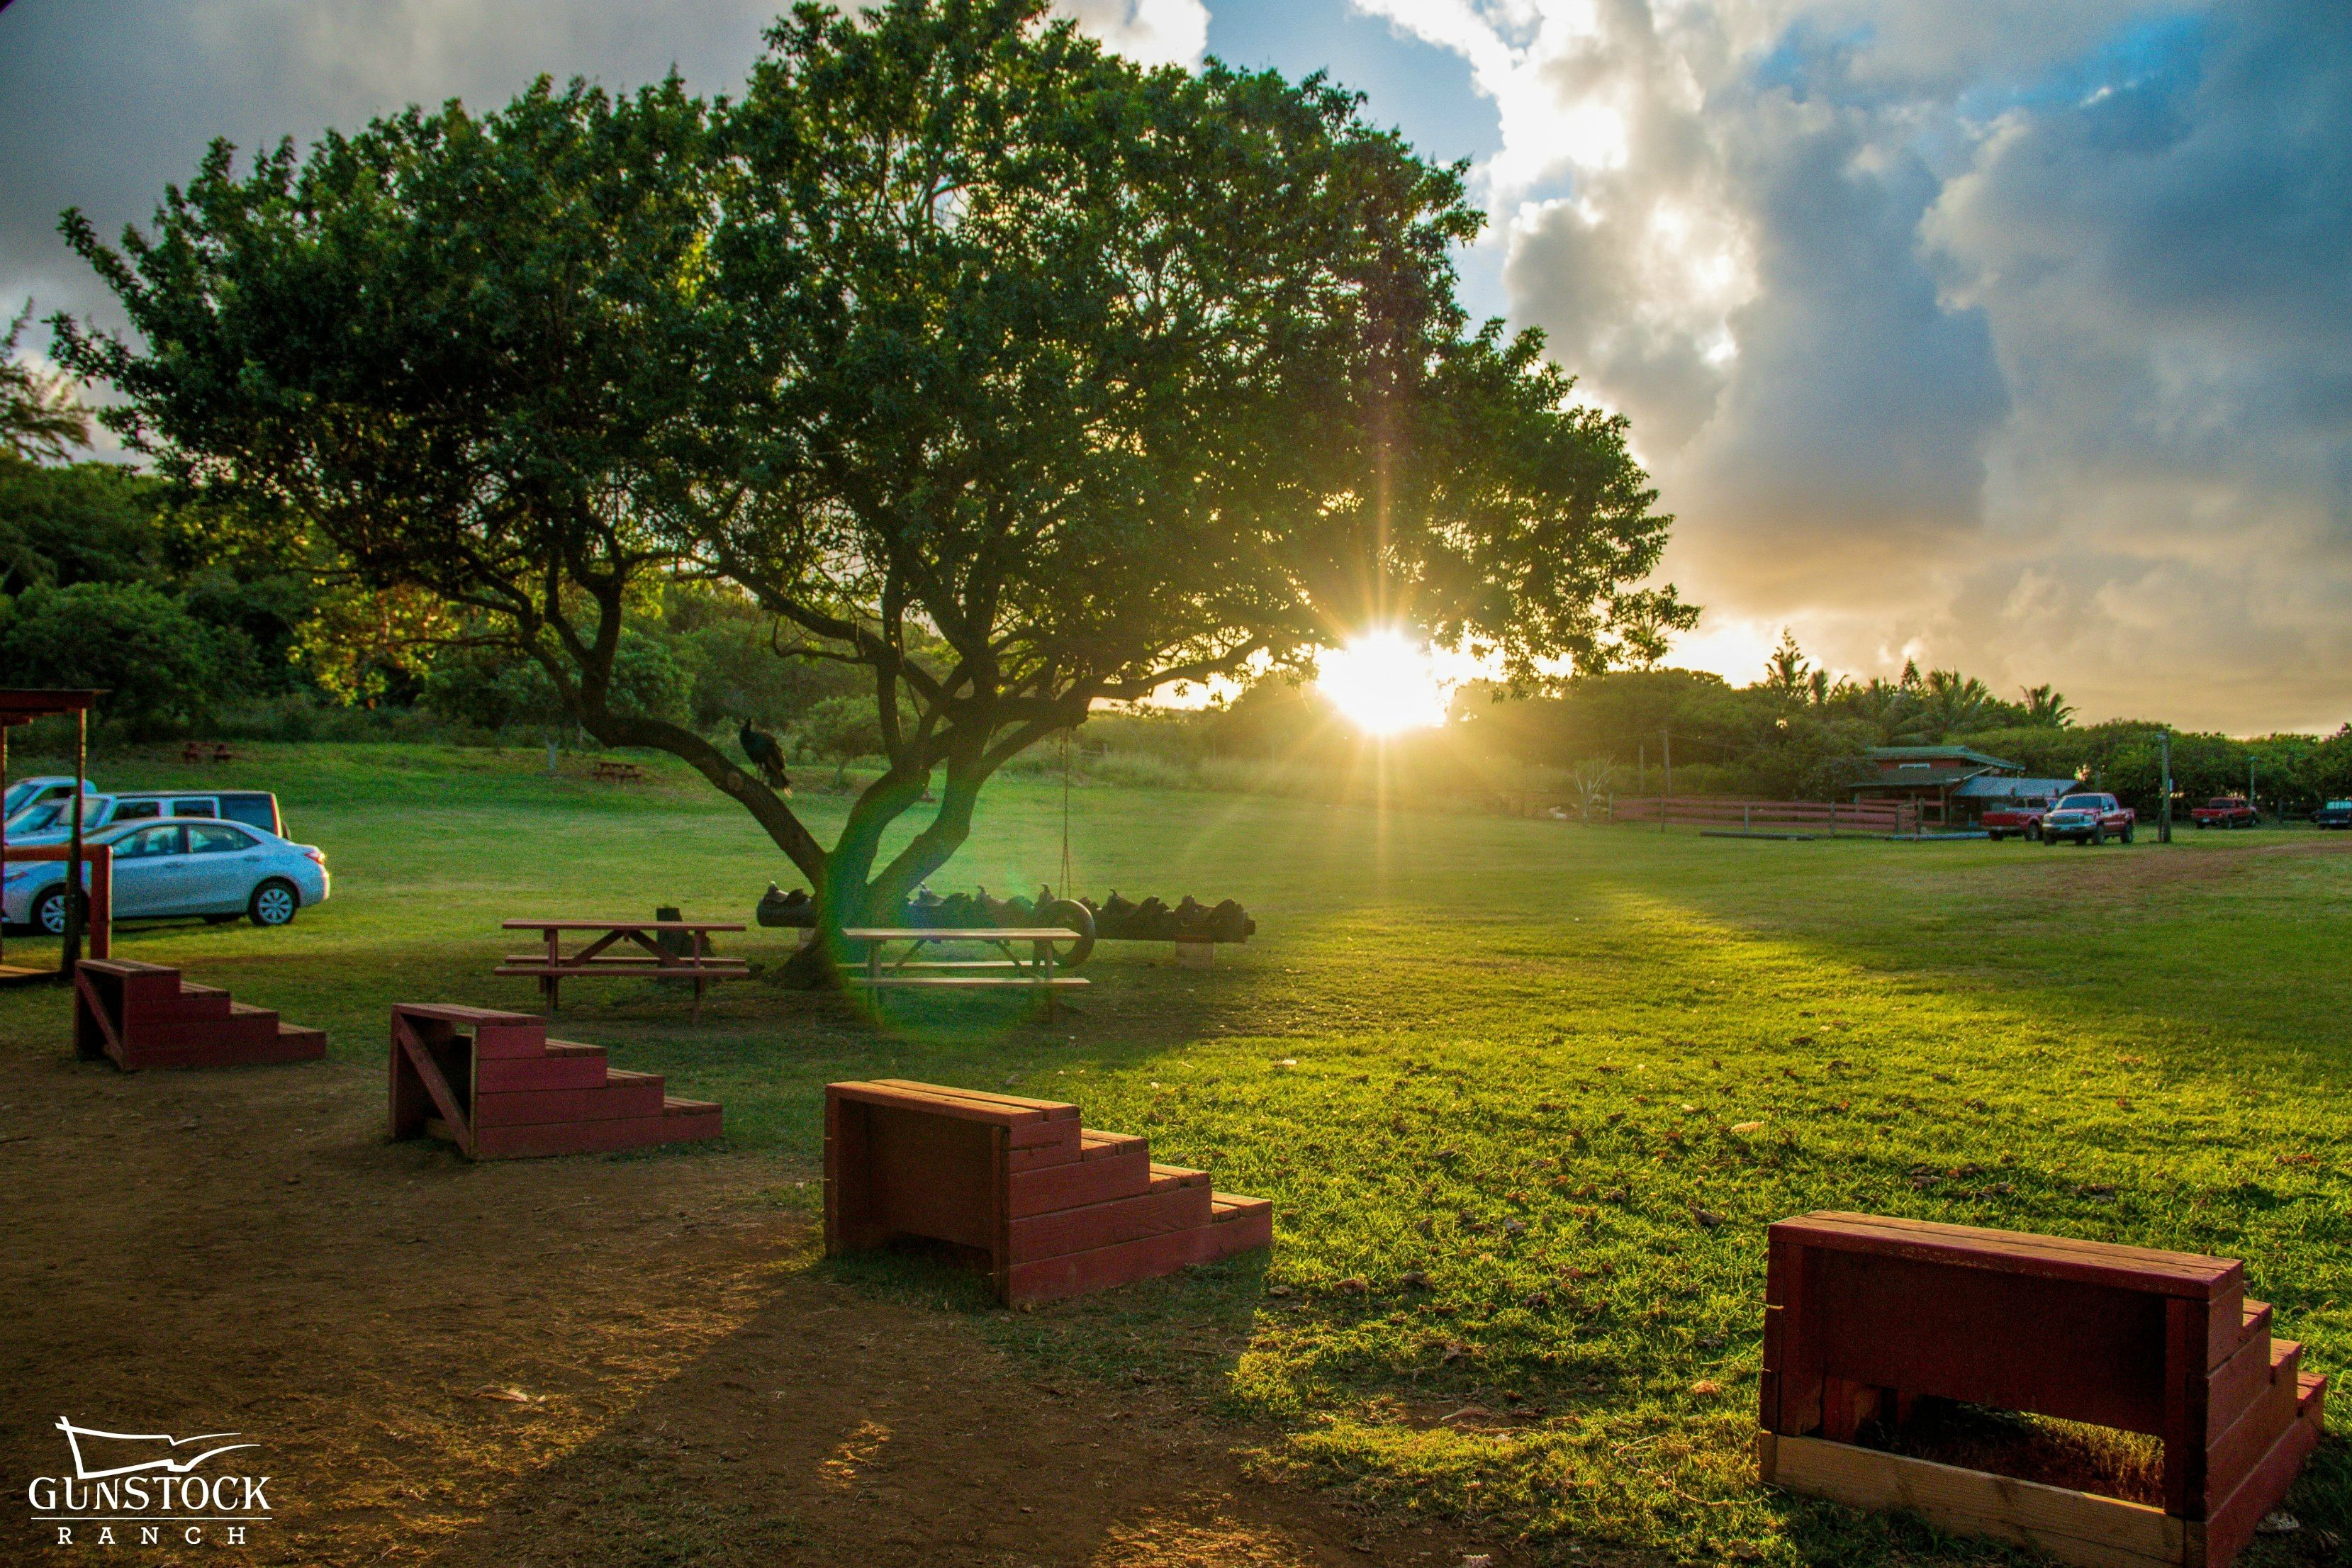 Sun setting at Gunstock Range in Hawaii